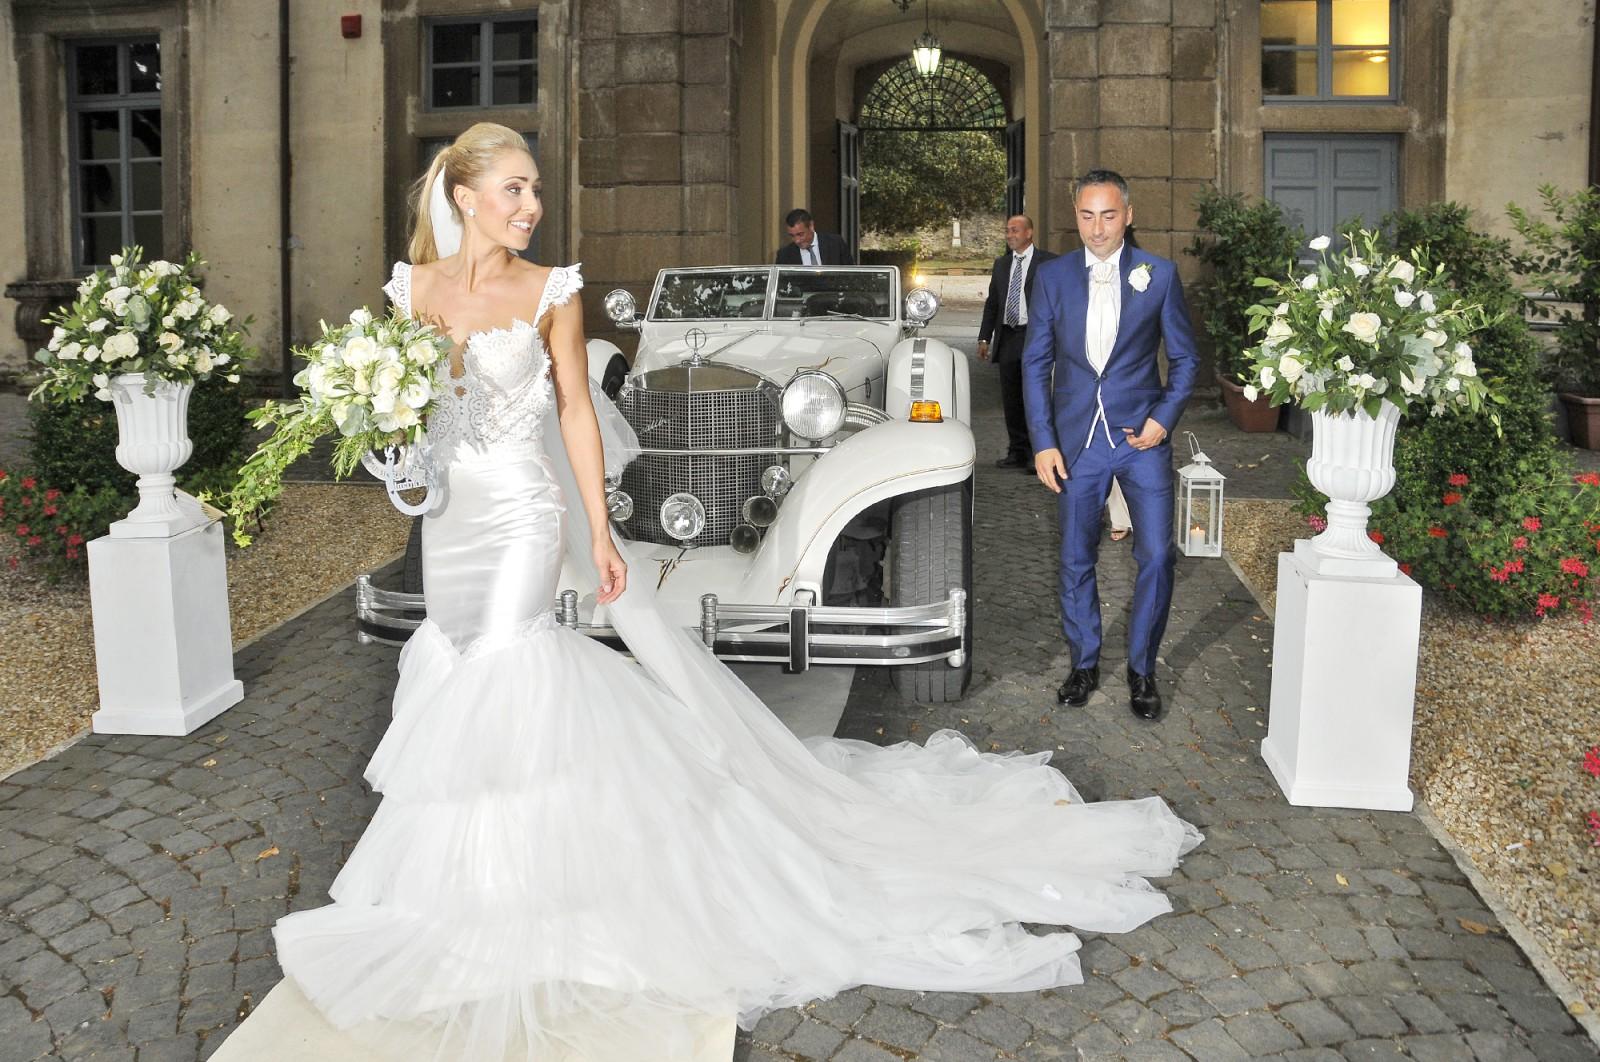 Zahavit tshuba megan 2015 second hand wedding dress on for Second hand wedding dresses for sale